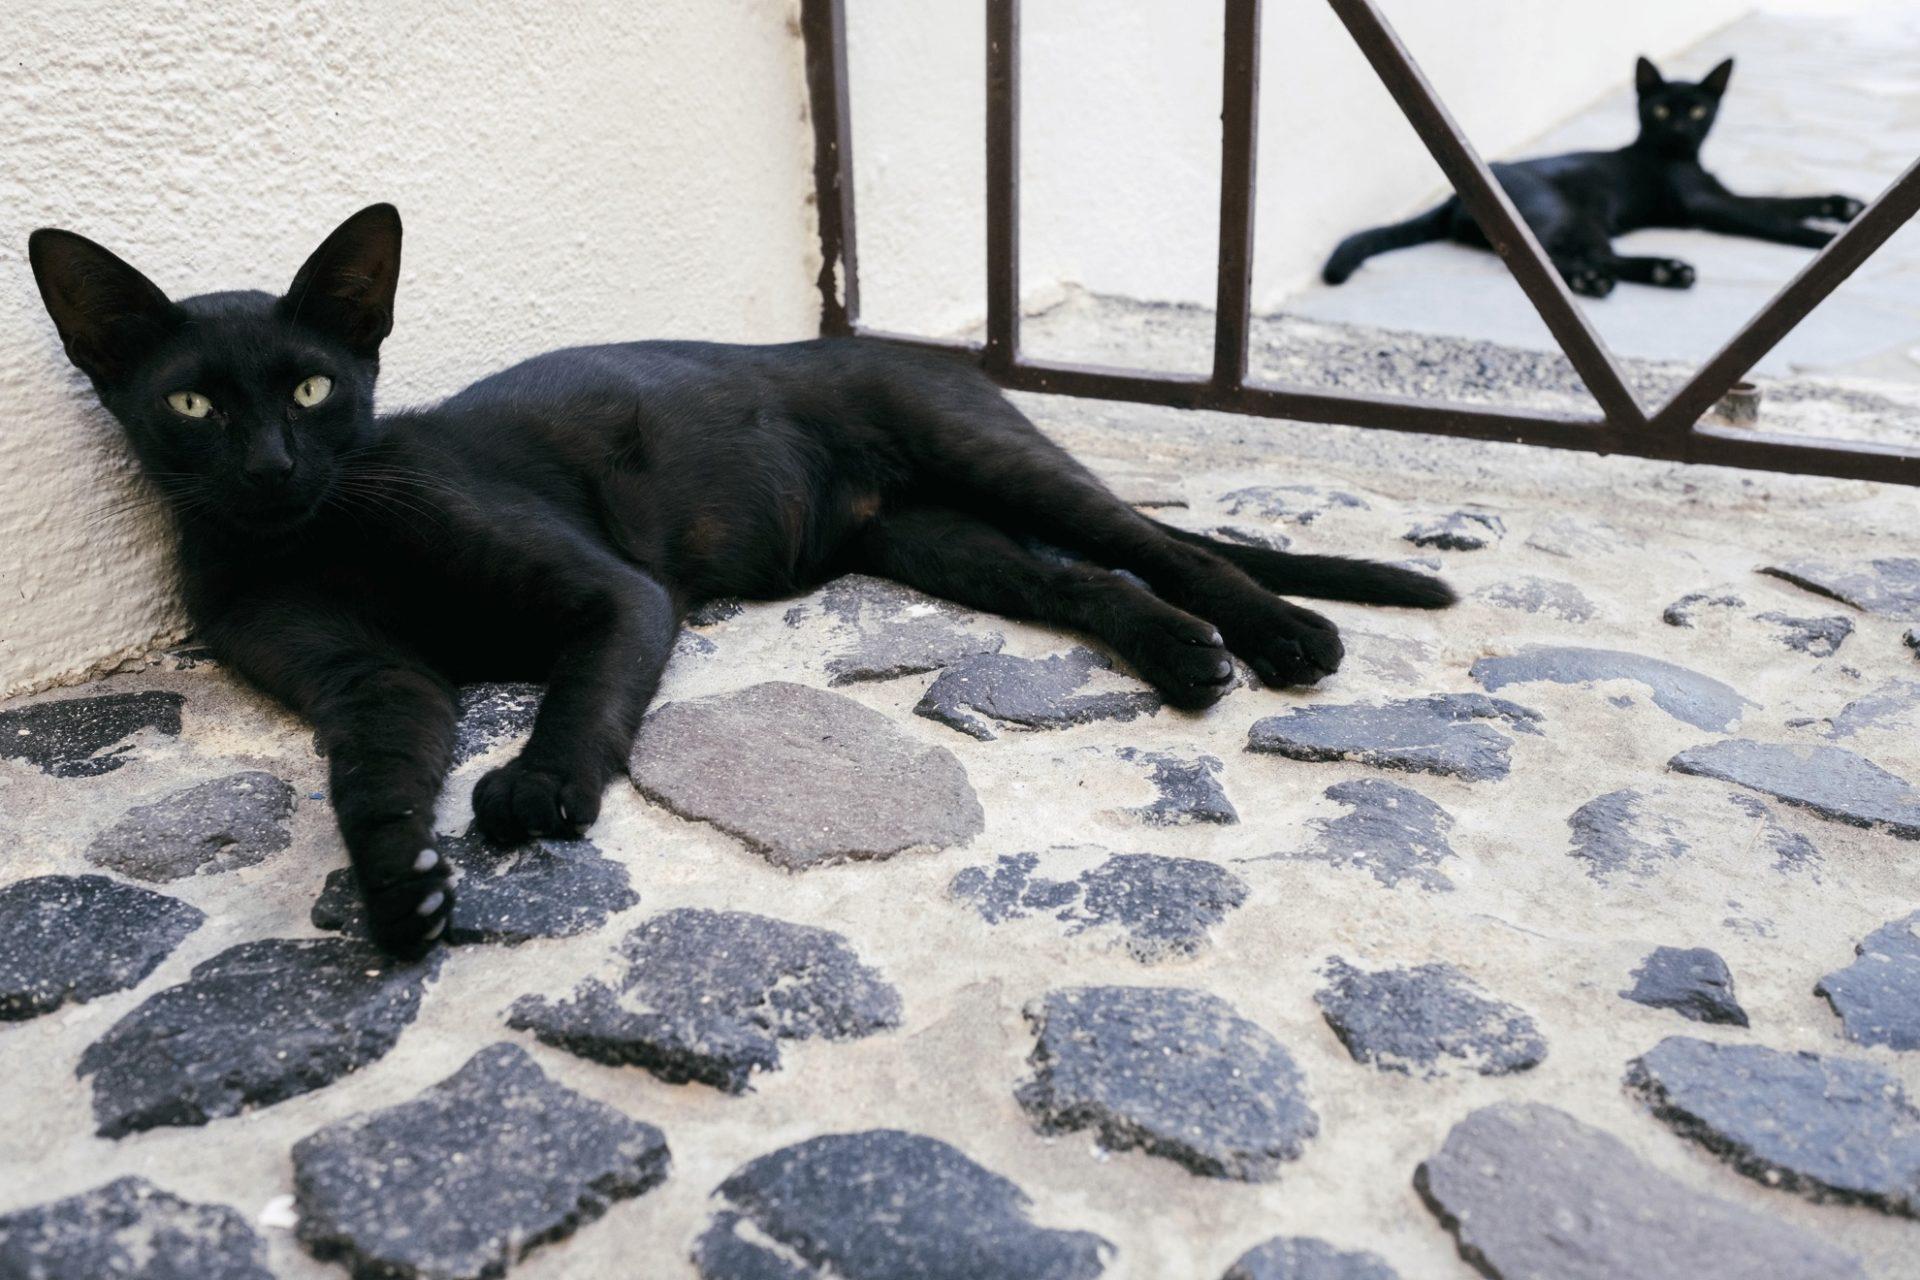 chats grecs@laurentparienti - 6